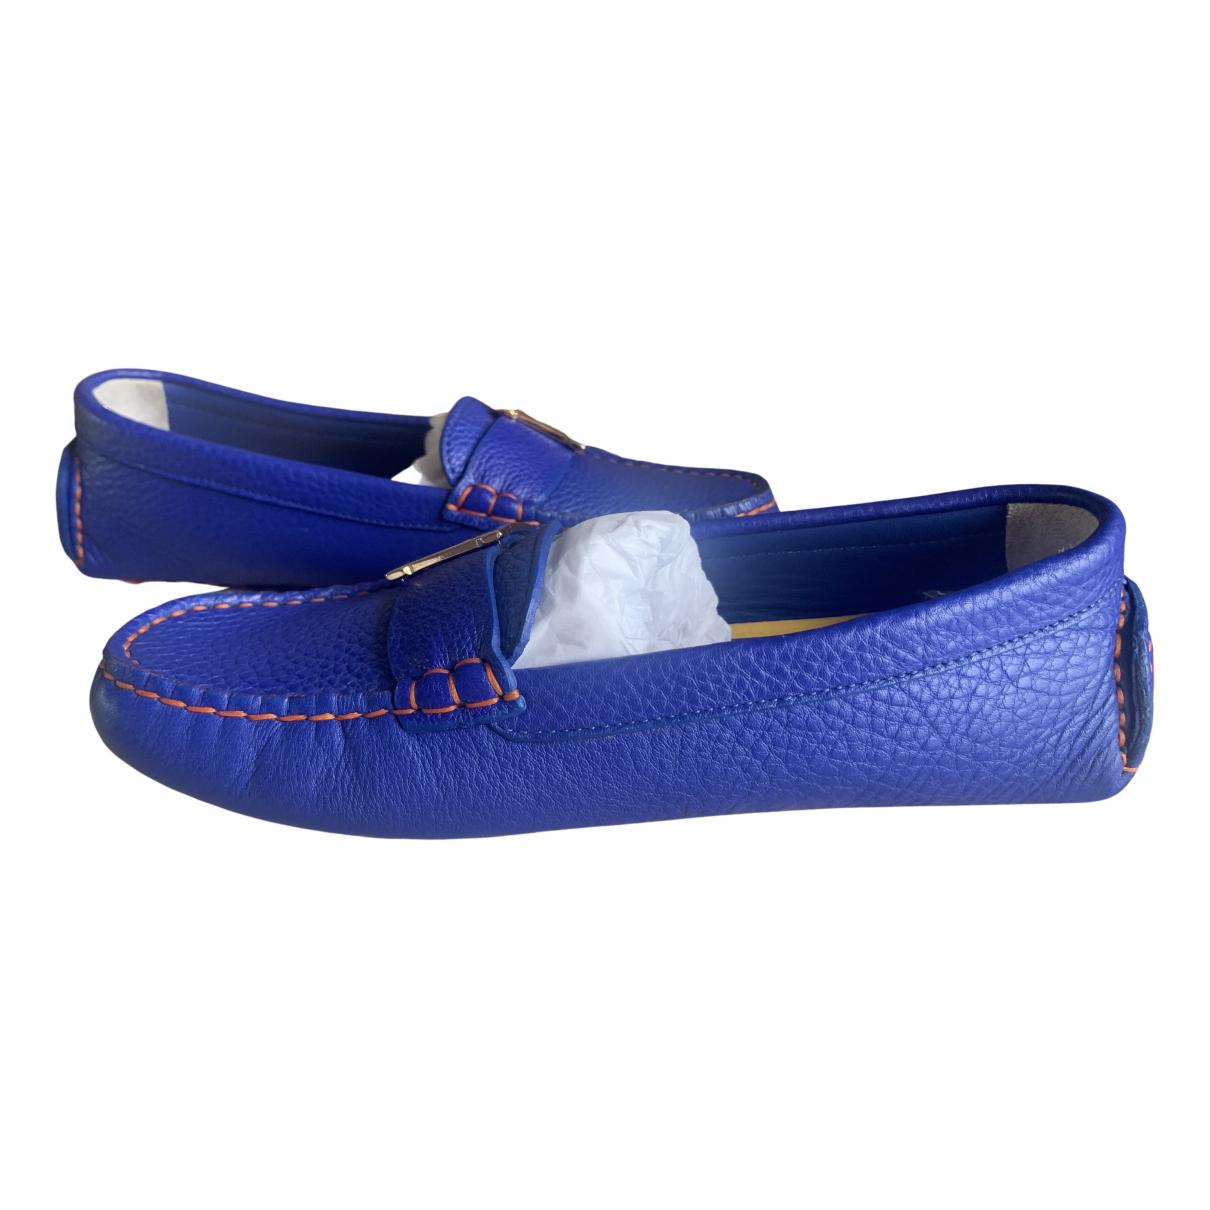 Fendi \N Mokassins in  Blau Leder